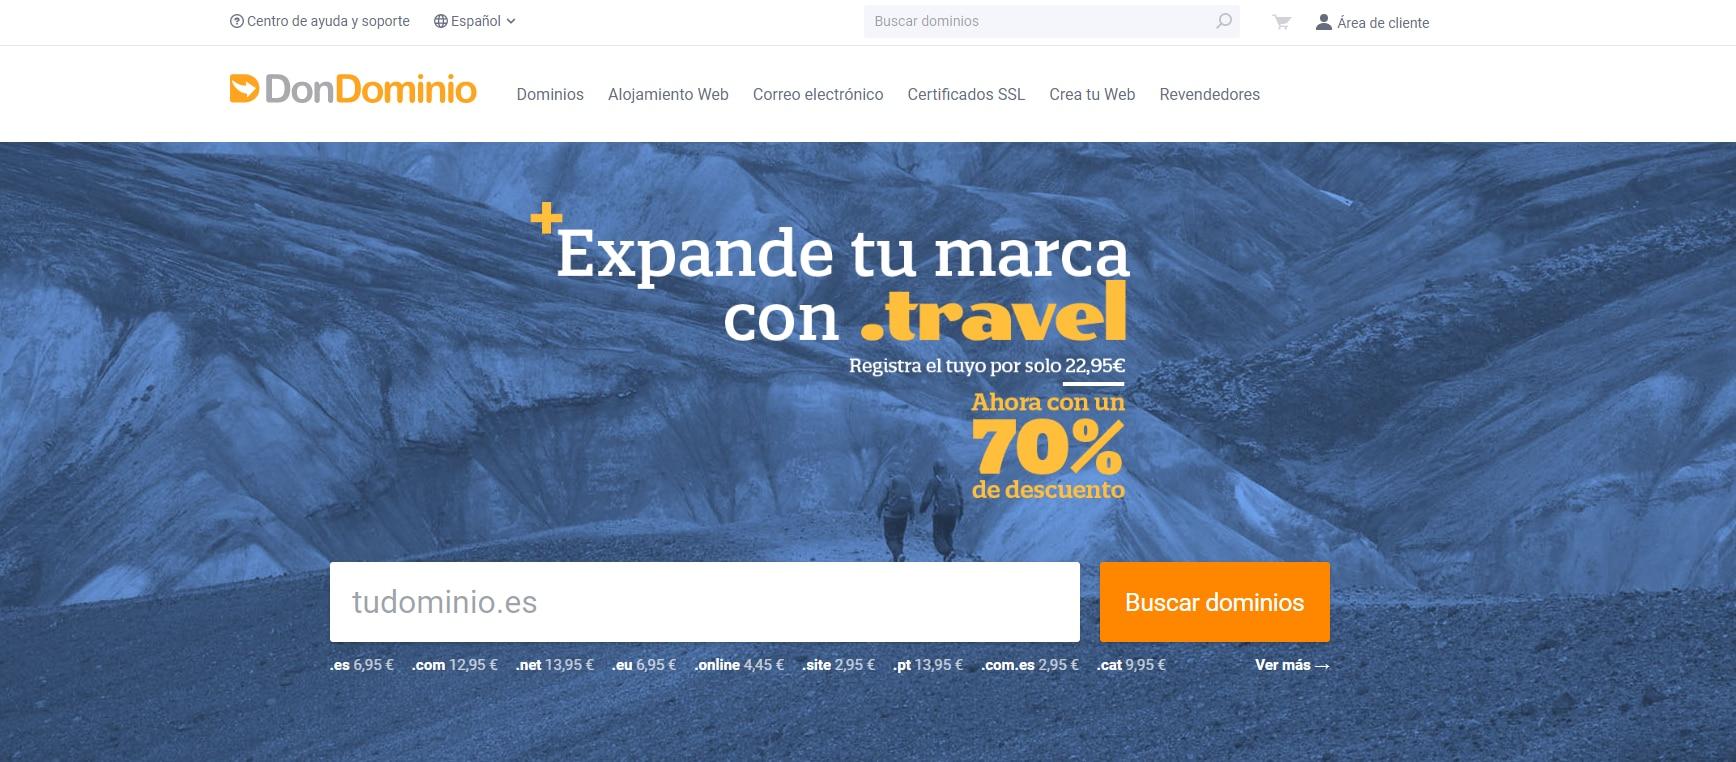 DonDominio 免费一年.travel ( 旅行 ) 域名